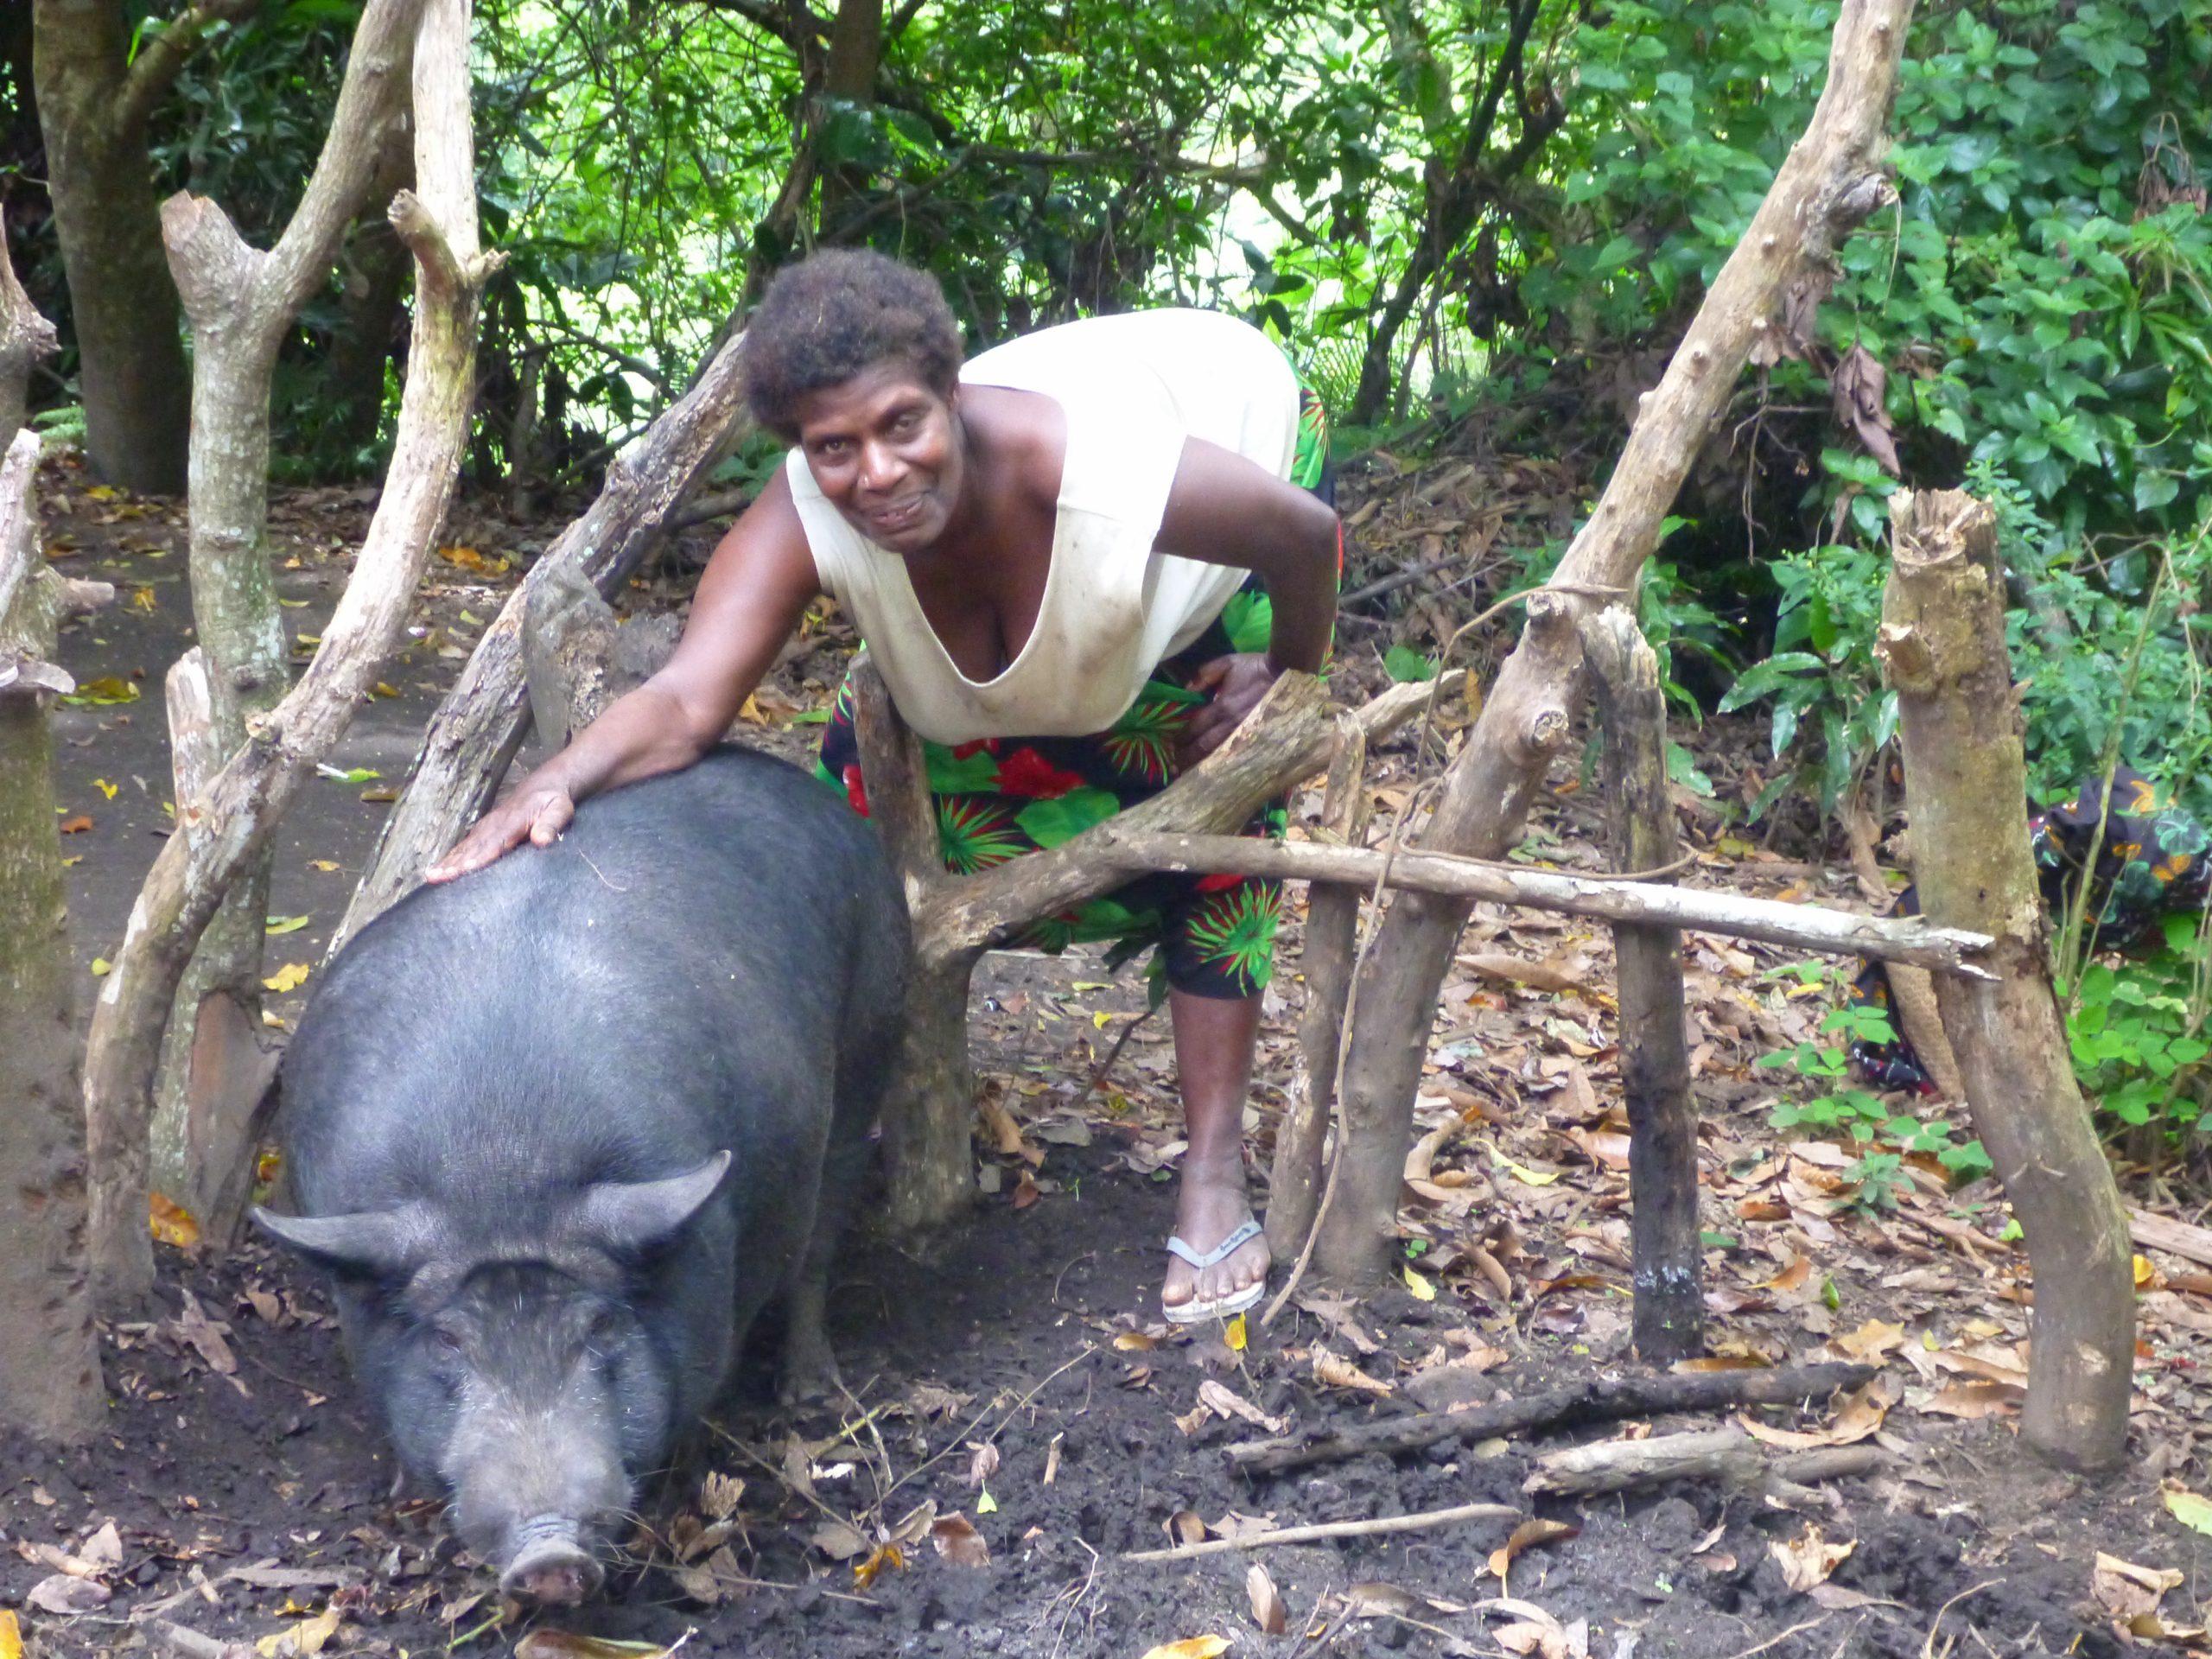 Putting gender into livestock work